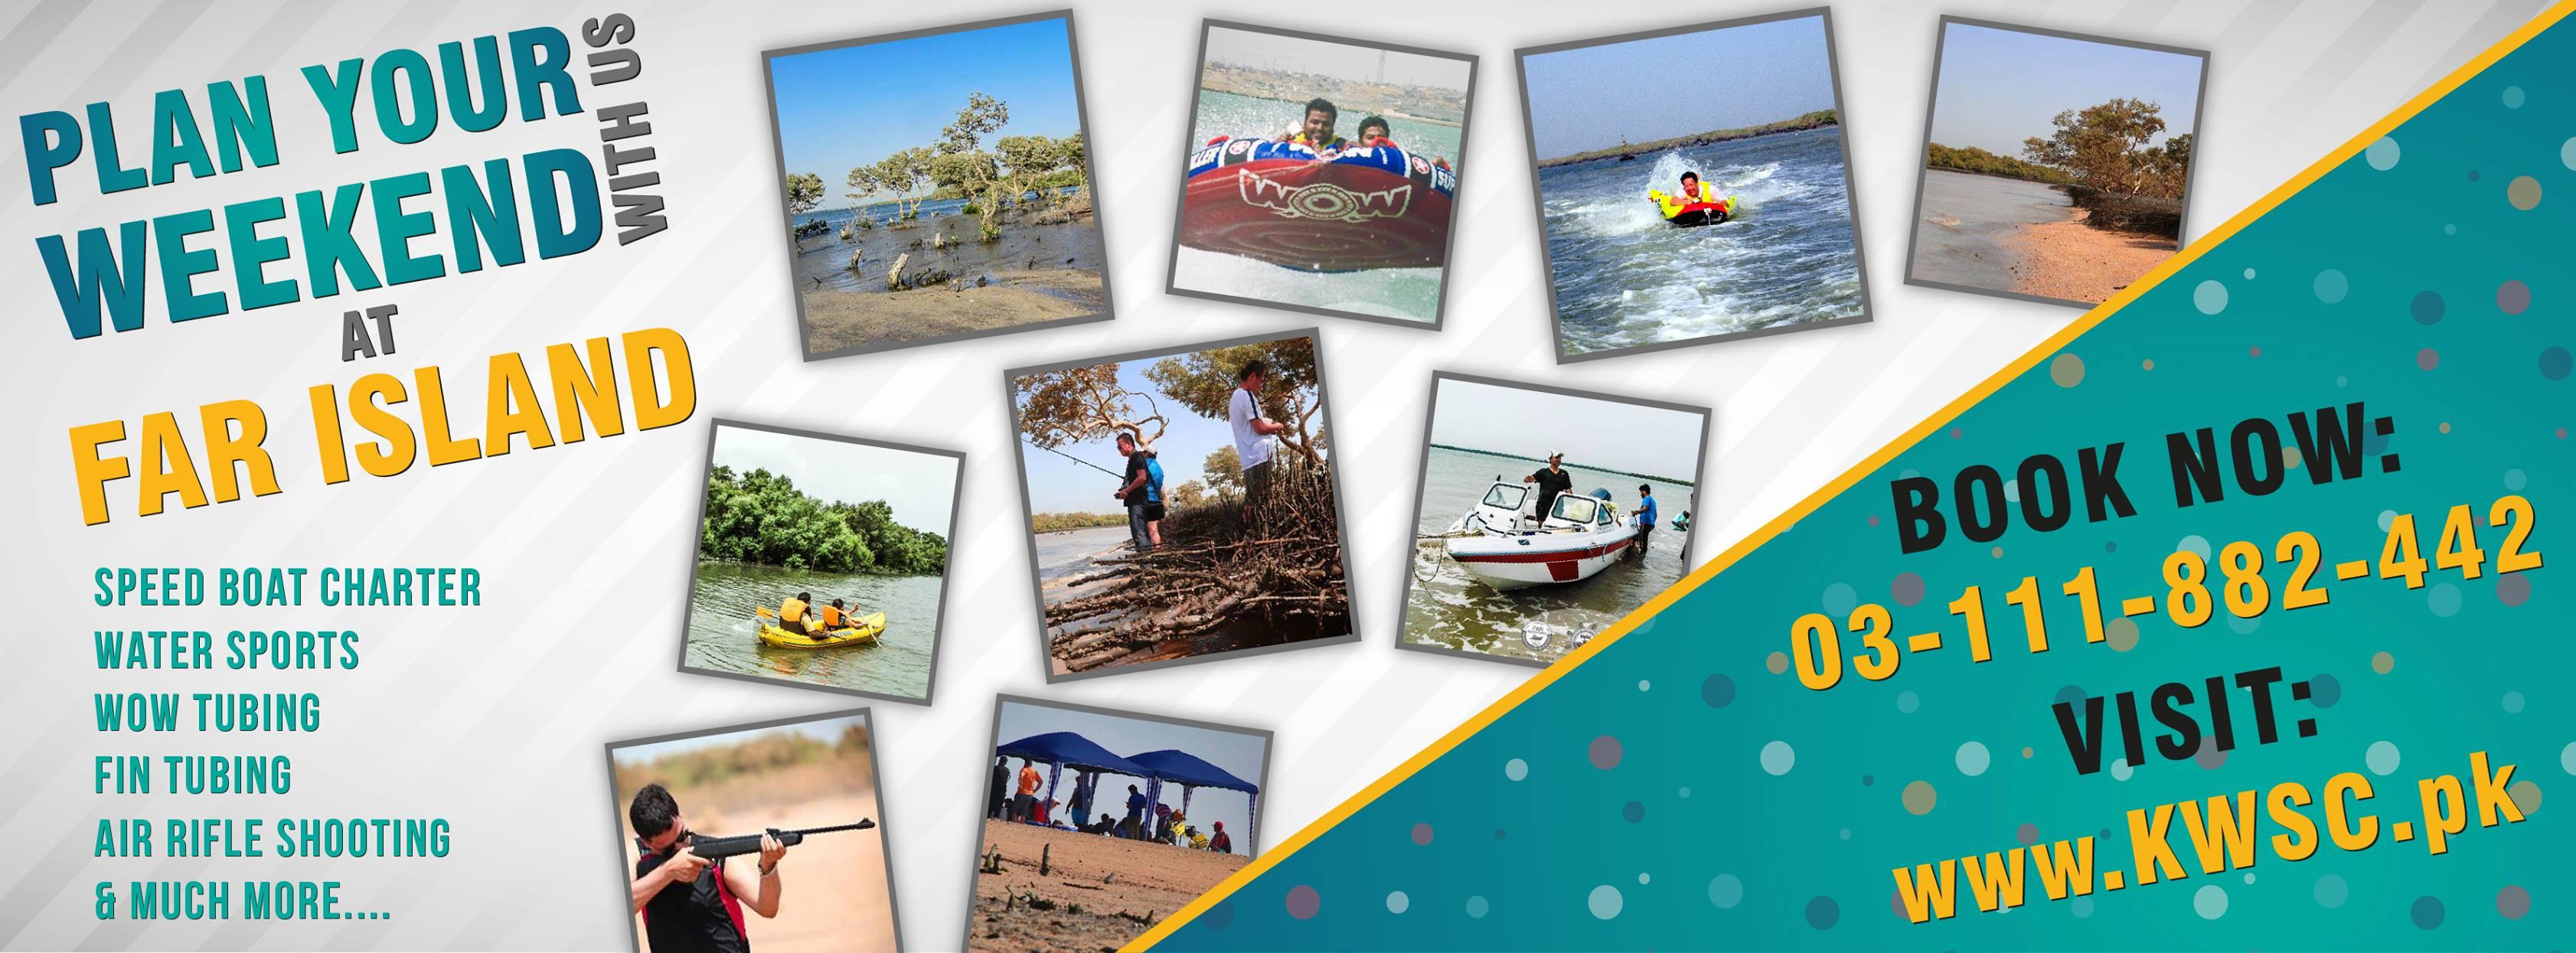 Karachi-Water-Sports-1